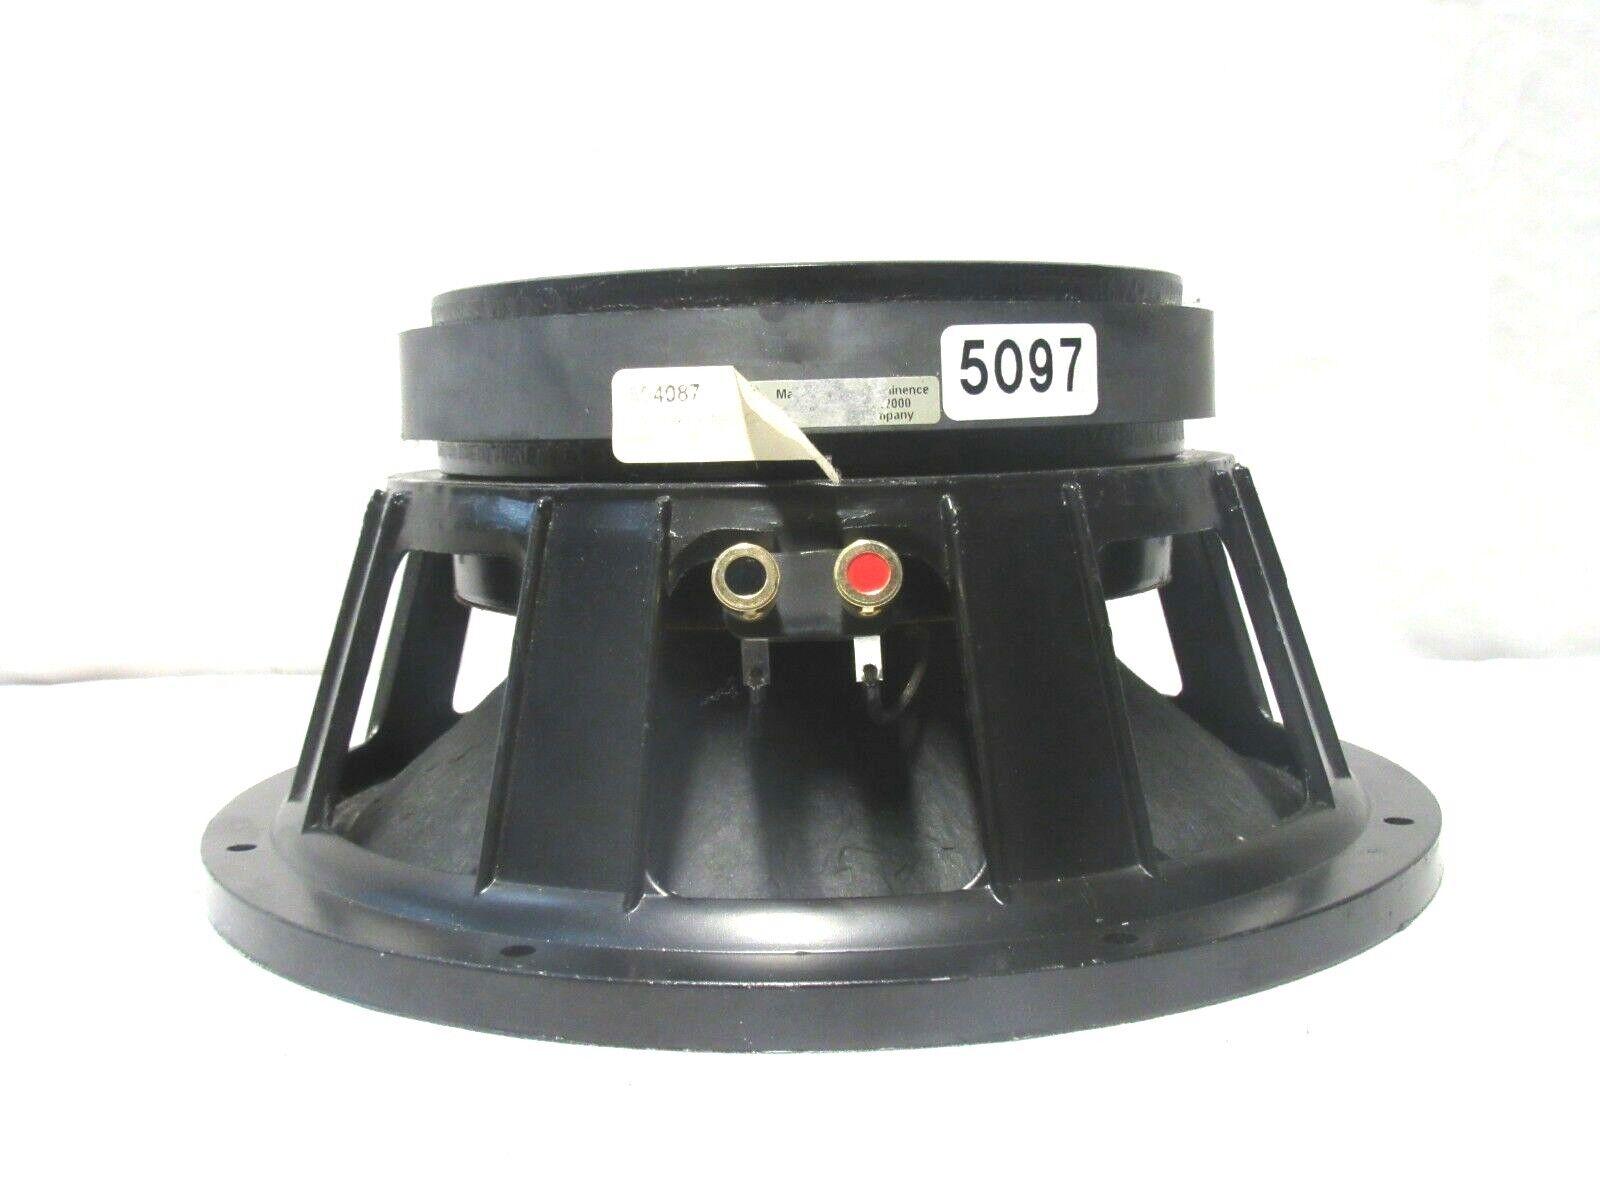 EAW LC-1214 12  8 OHM PROFESSIONAL LOUDSPEAKER  5097 (ONE)